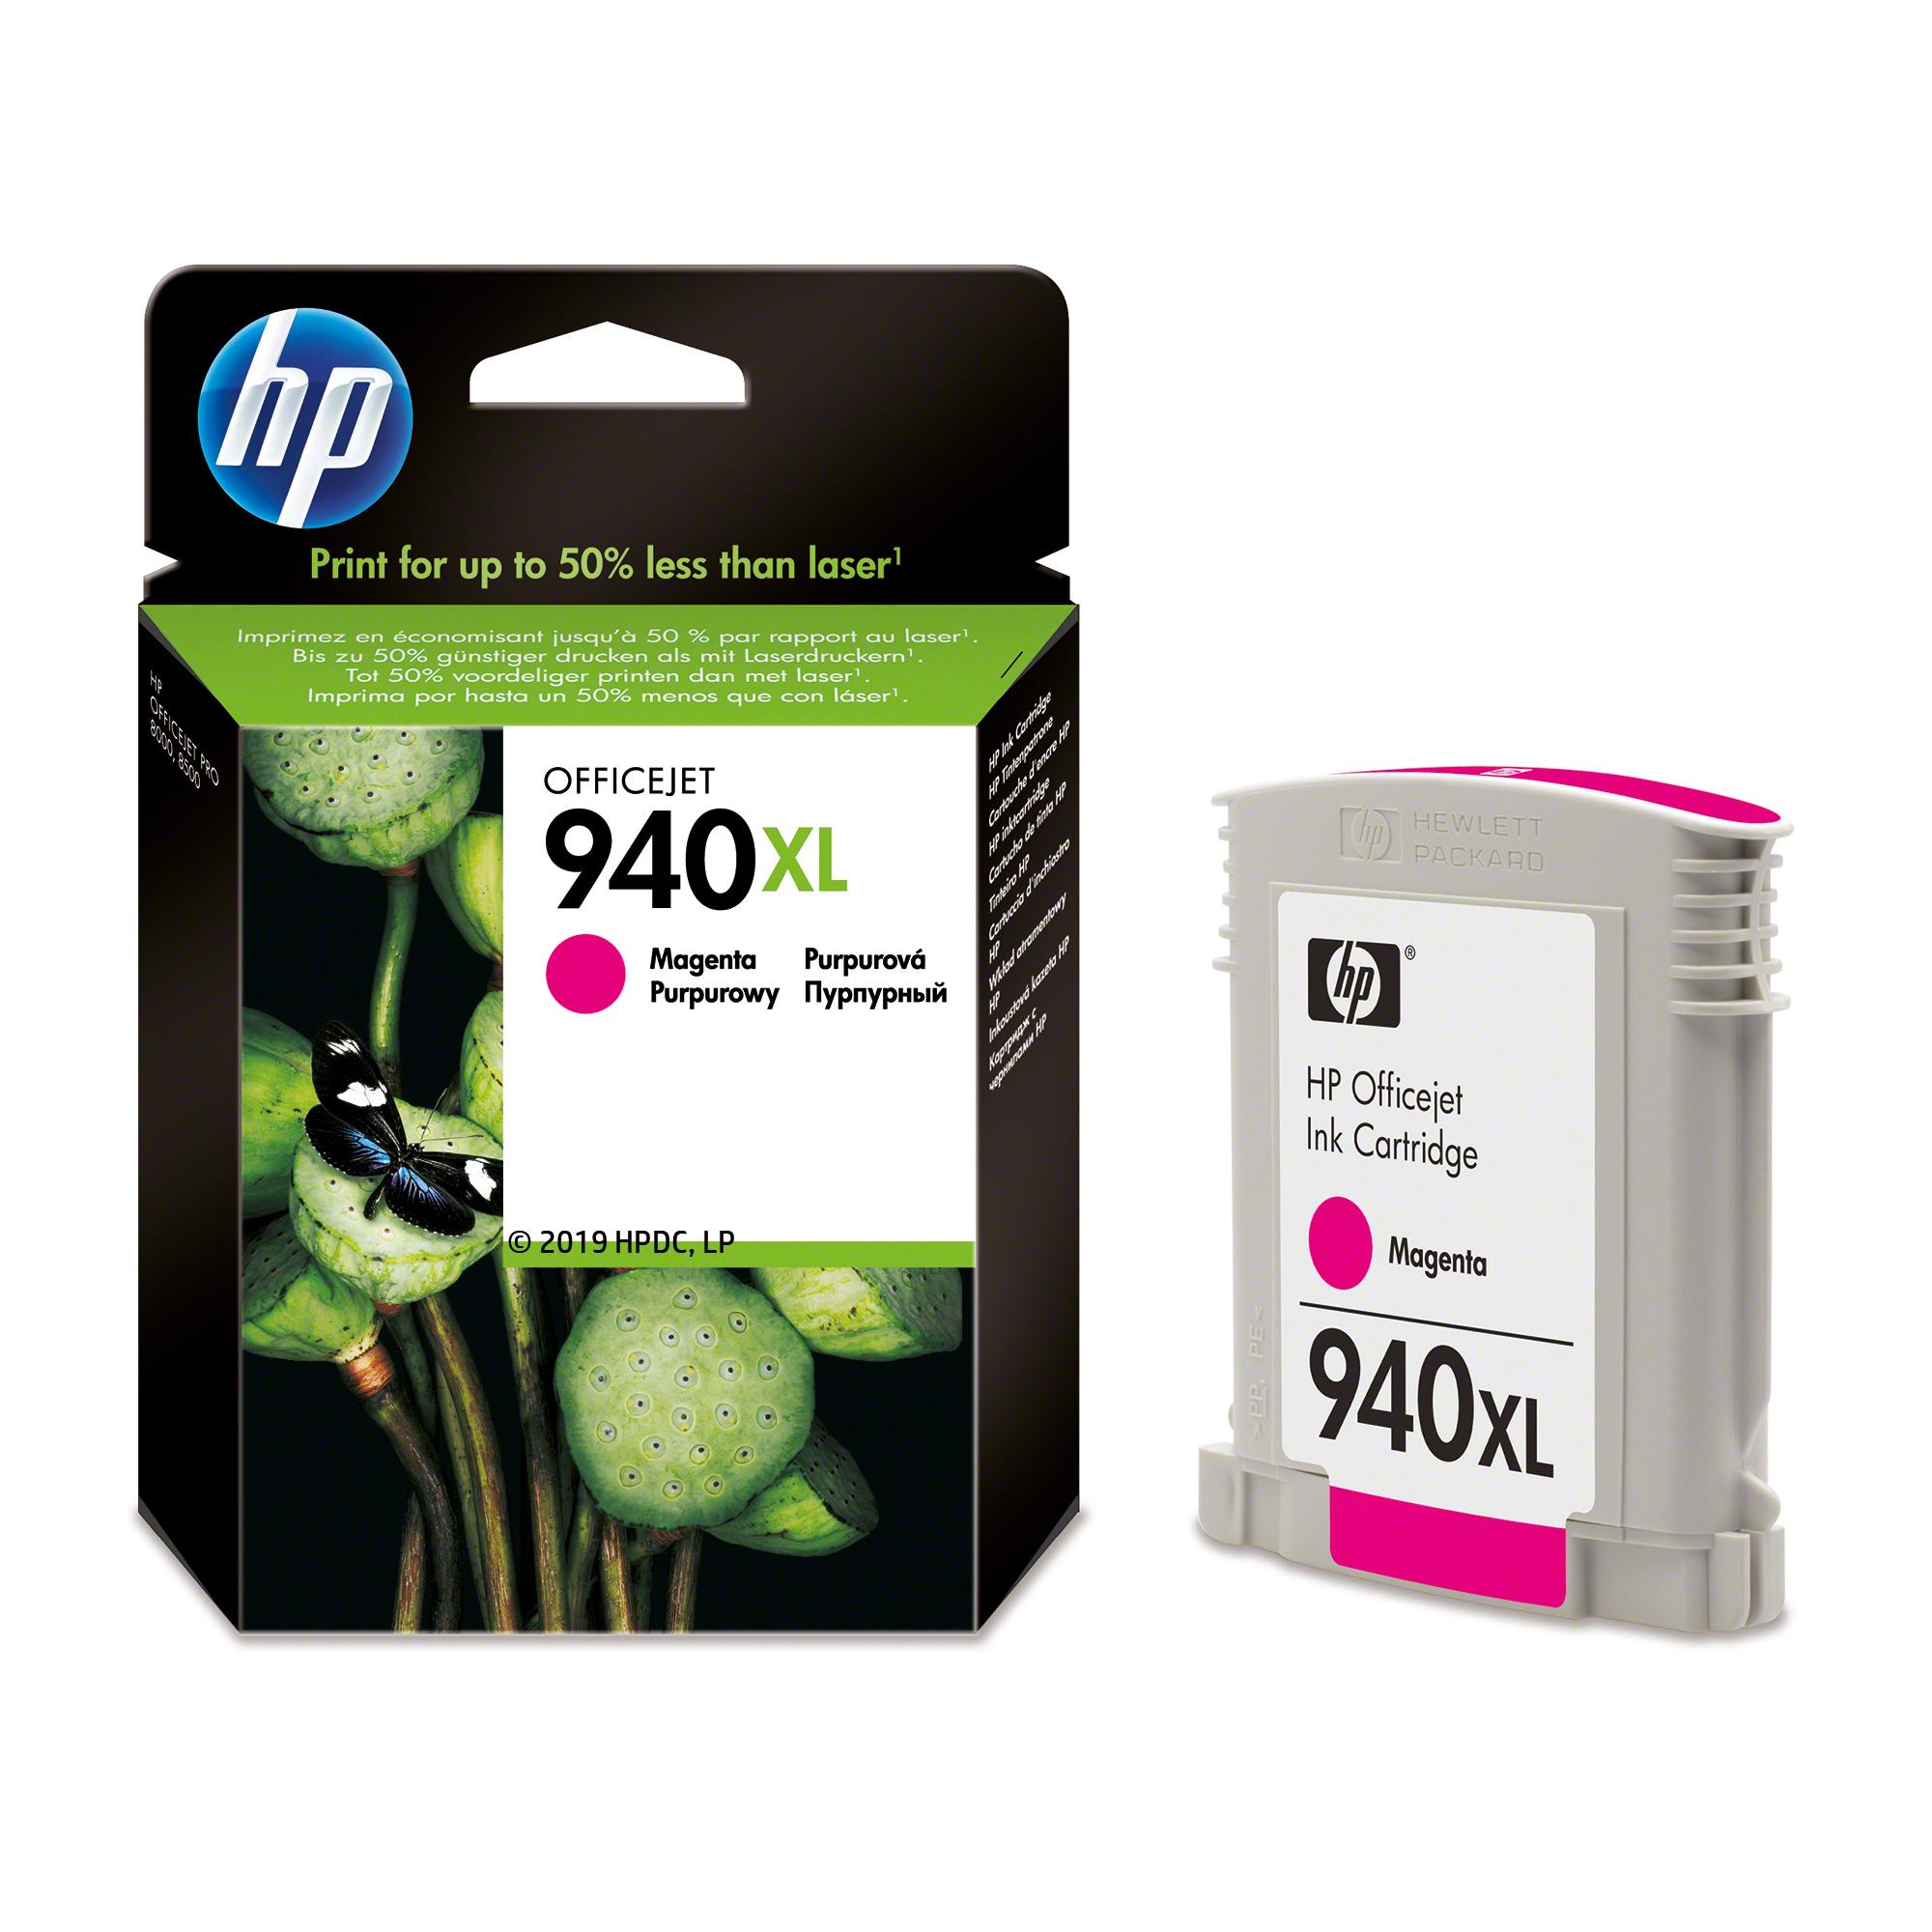 C4908AE inkjetcartridge magenta nr. 940XL (1400 afdrukken)